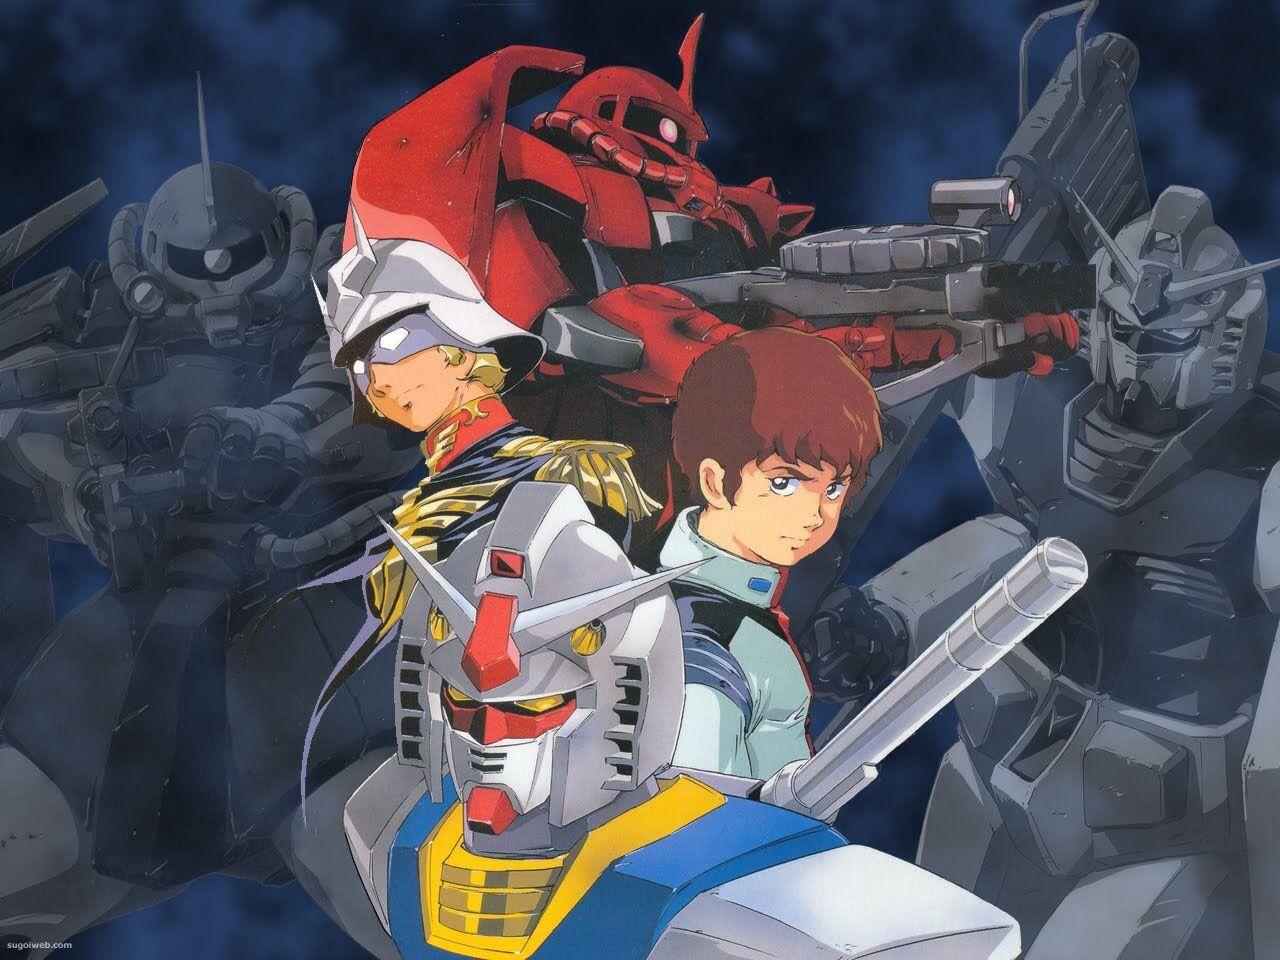 Mobile Suit Gundam Gundam wallpapers, Gundam, Mobile